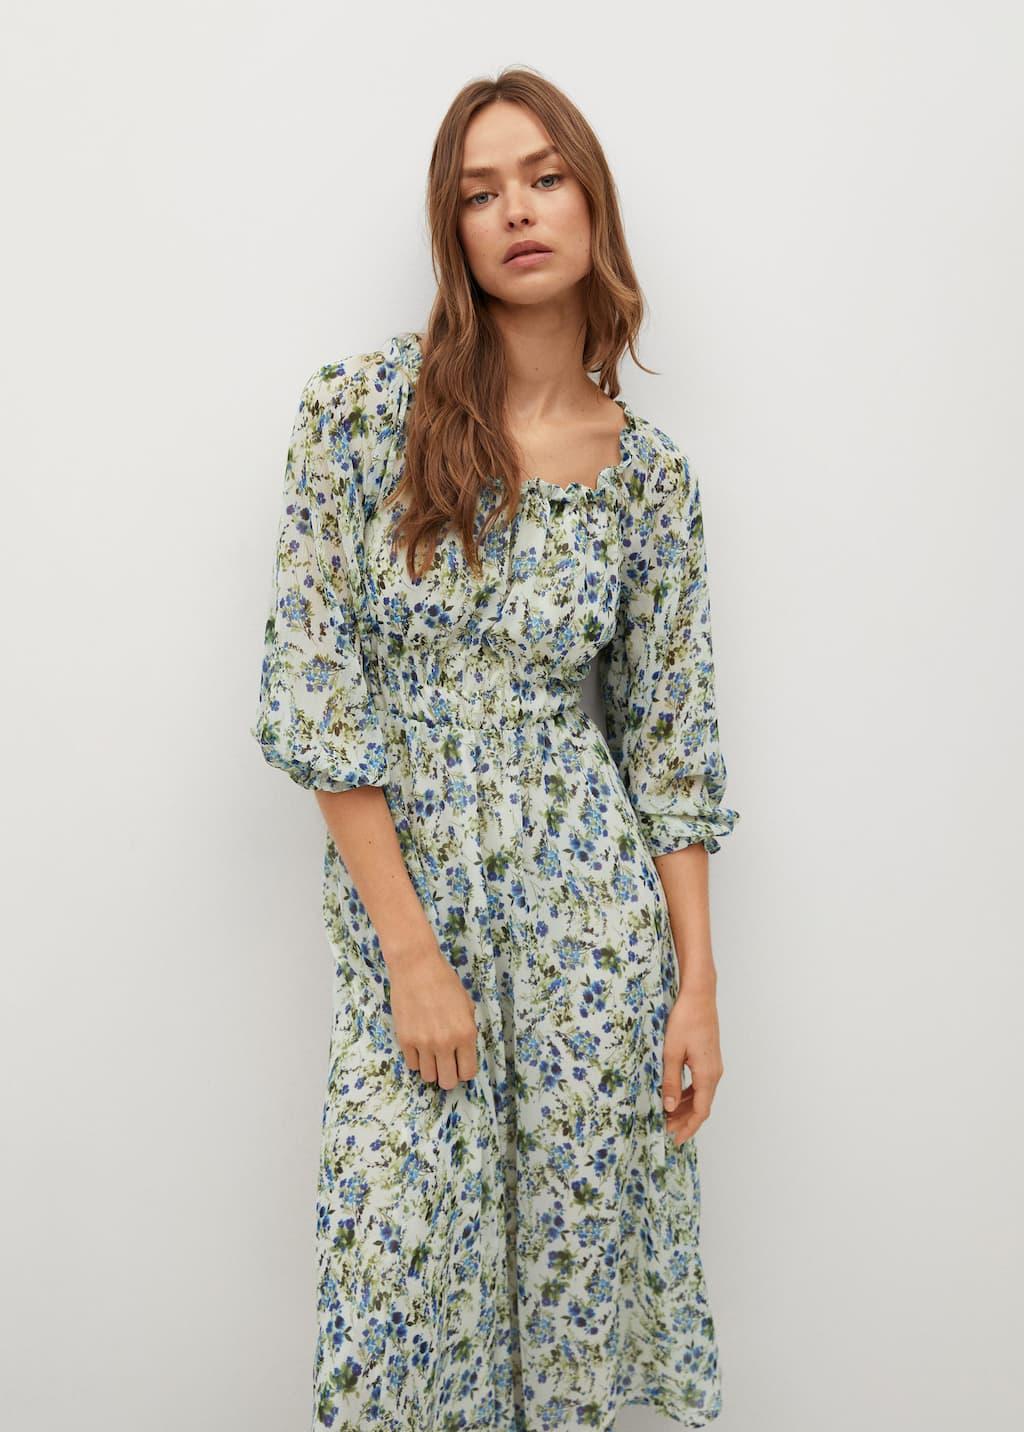 Printed dress with balloon sleeves - Medium plane